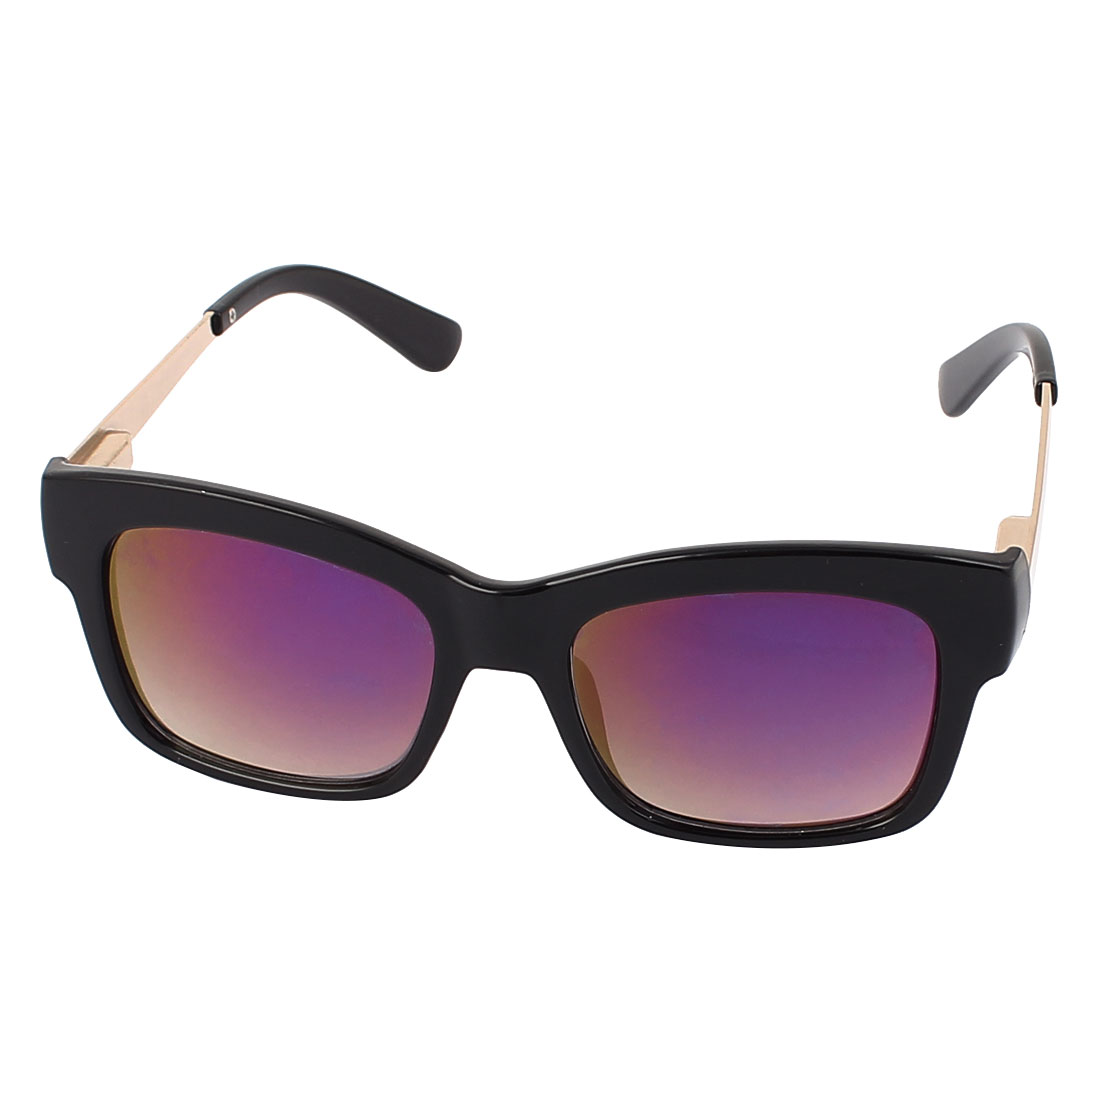 Ladies Full Rim Gray Lens Sun Protection Outdoor Sunglasses Eyewear